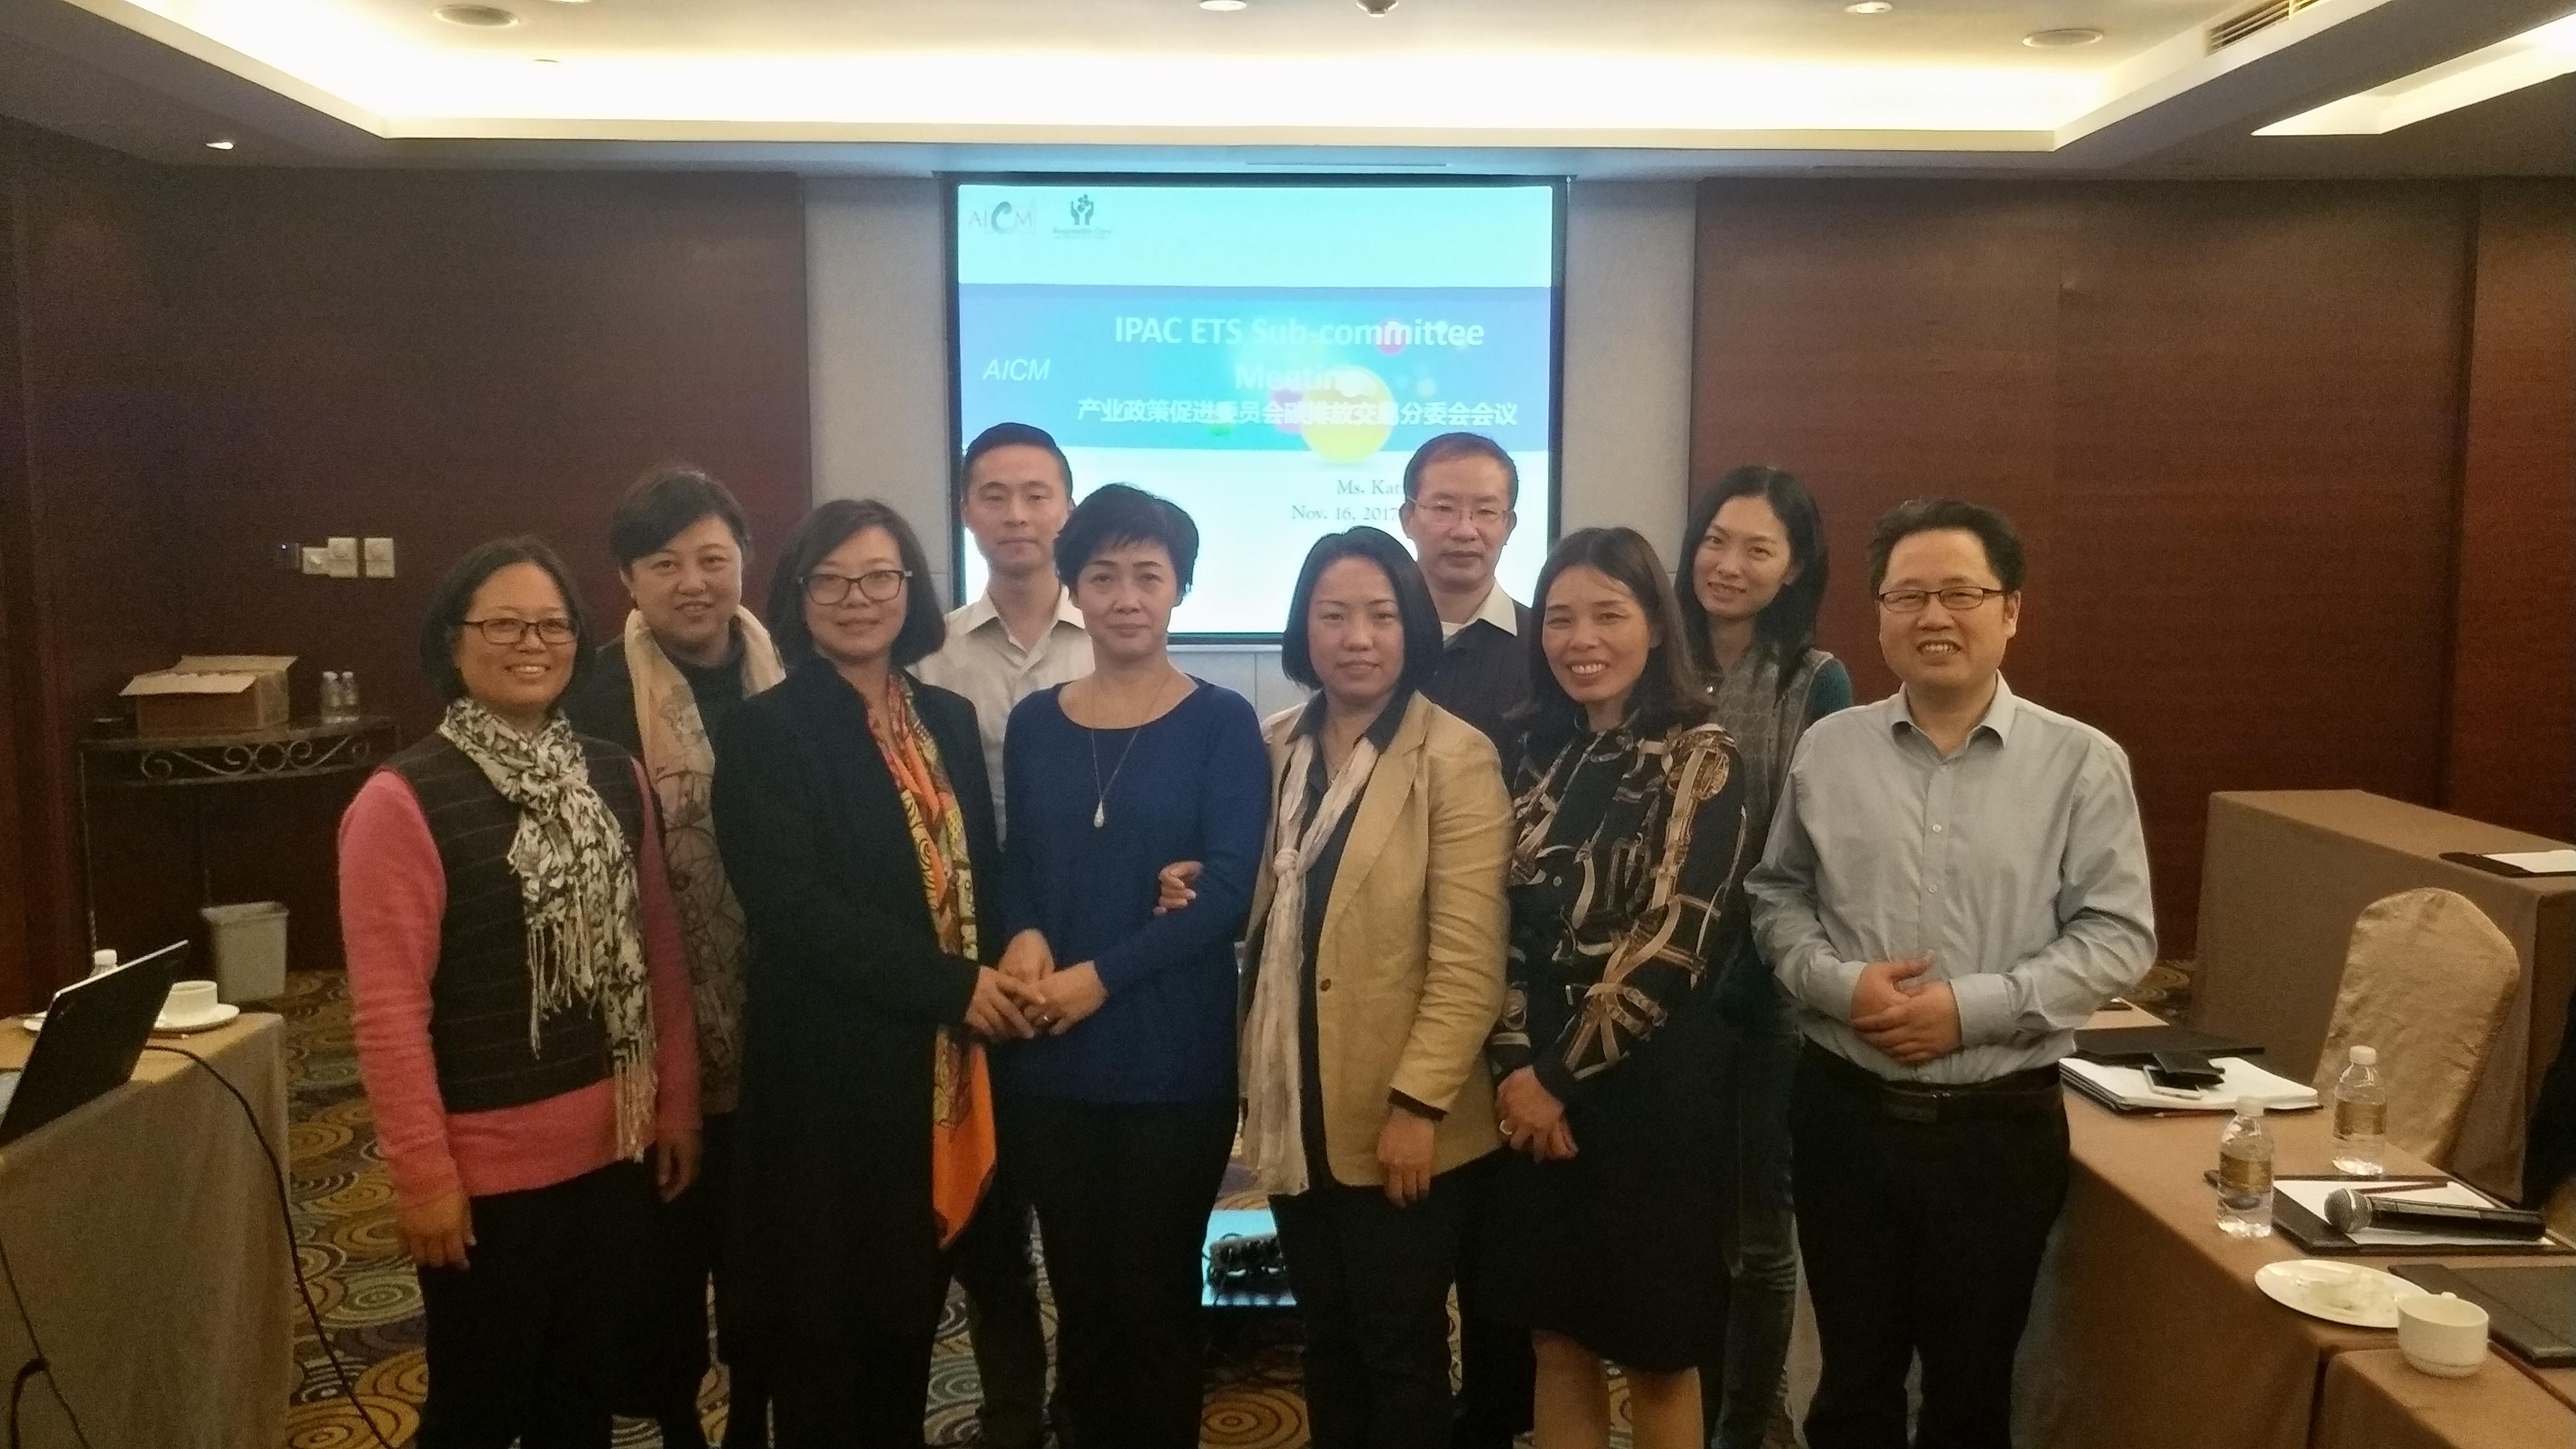 AICM碳排放交易分委会回顾2017碳排放交易进展并讨论确定2018年工作计划